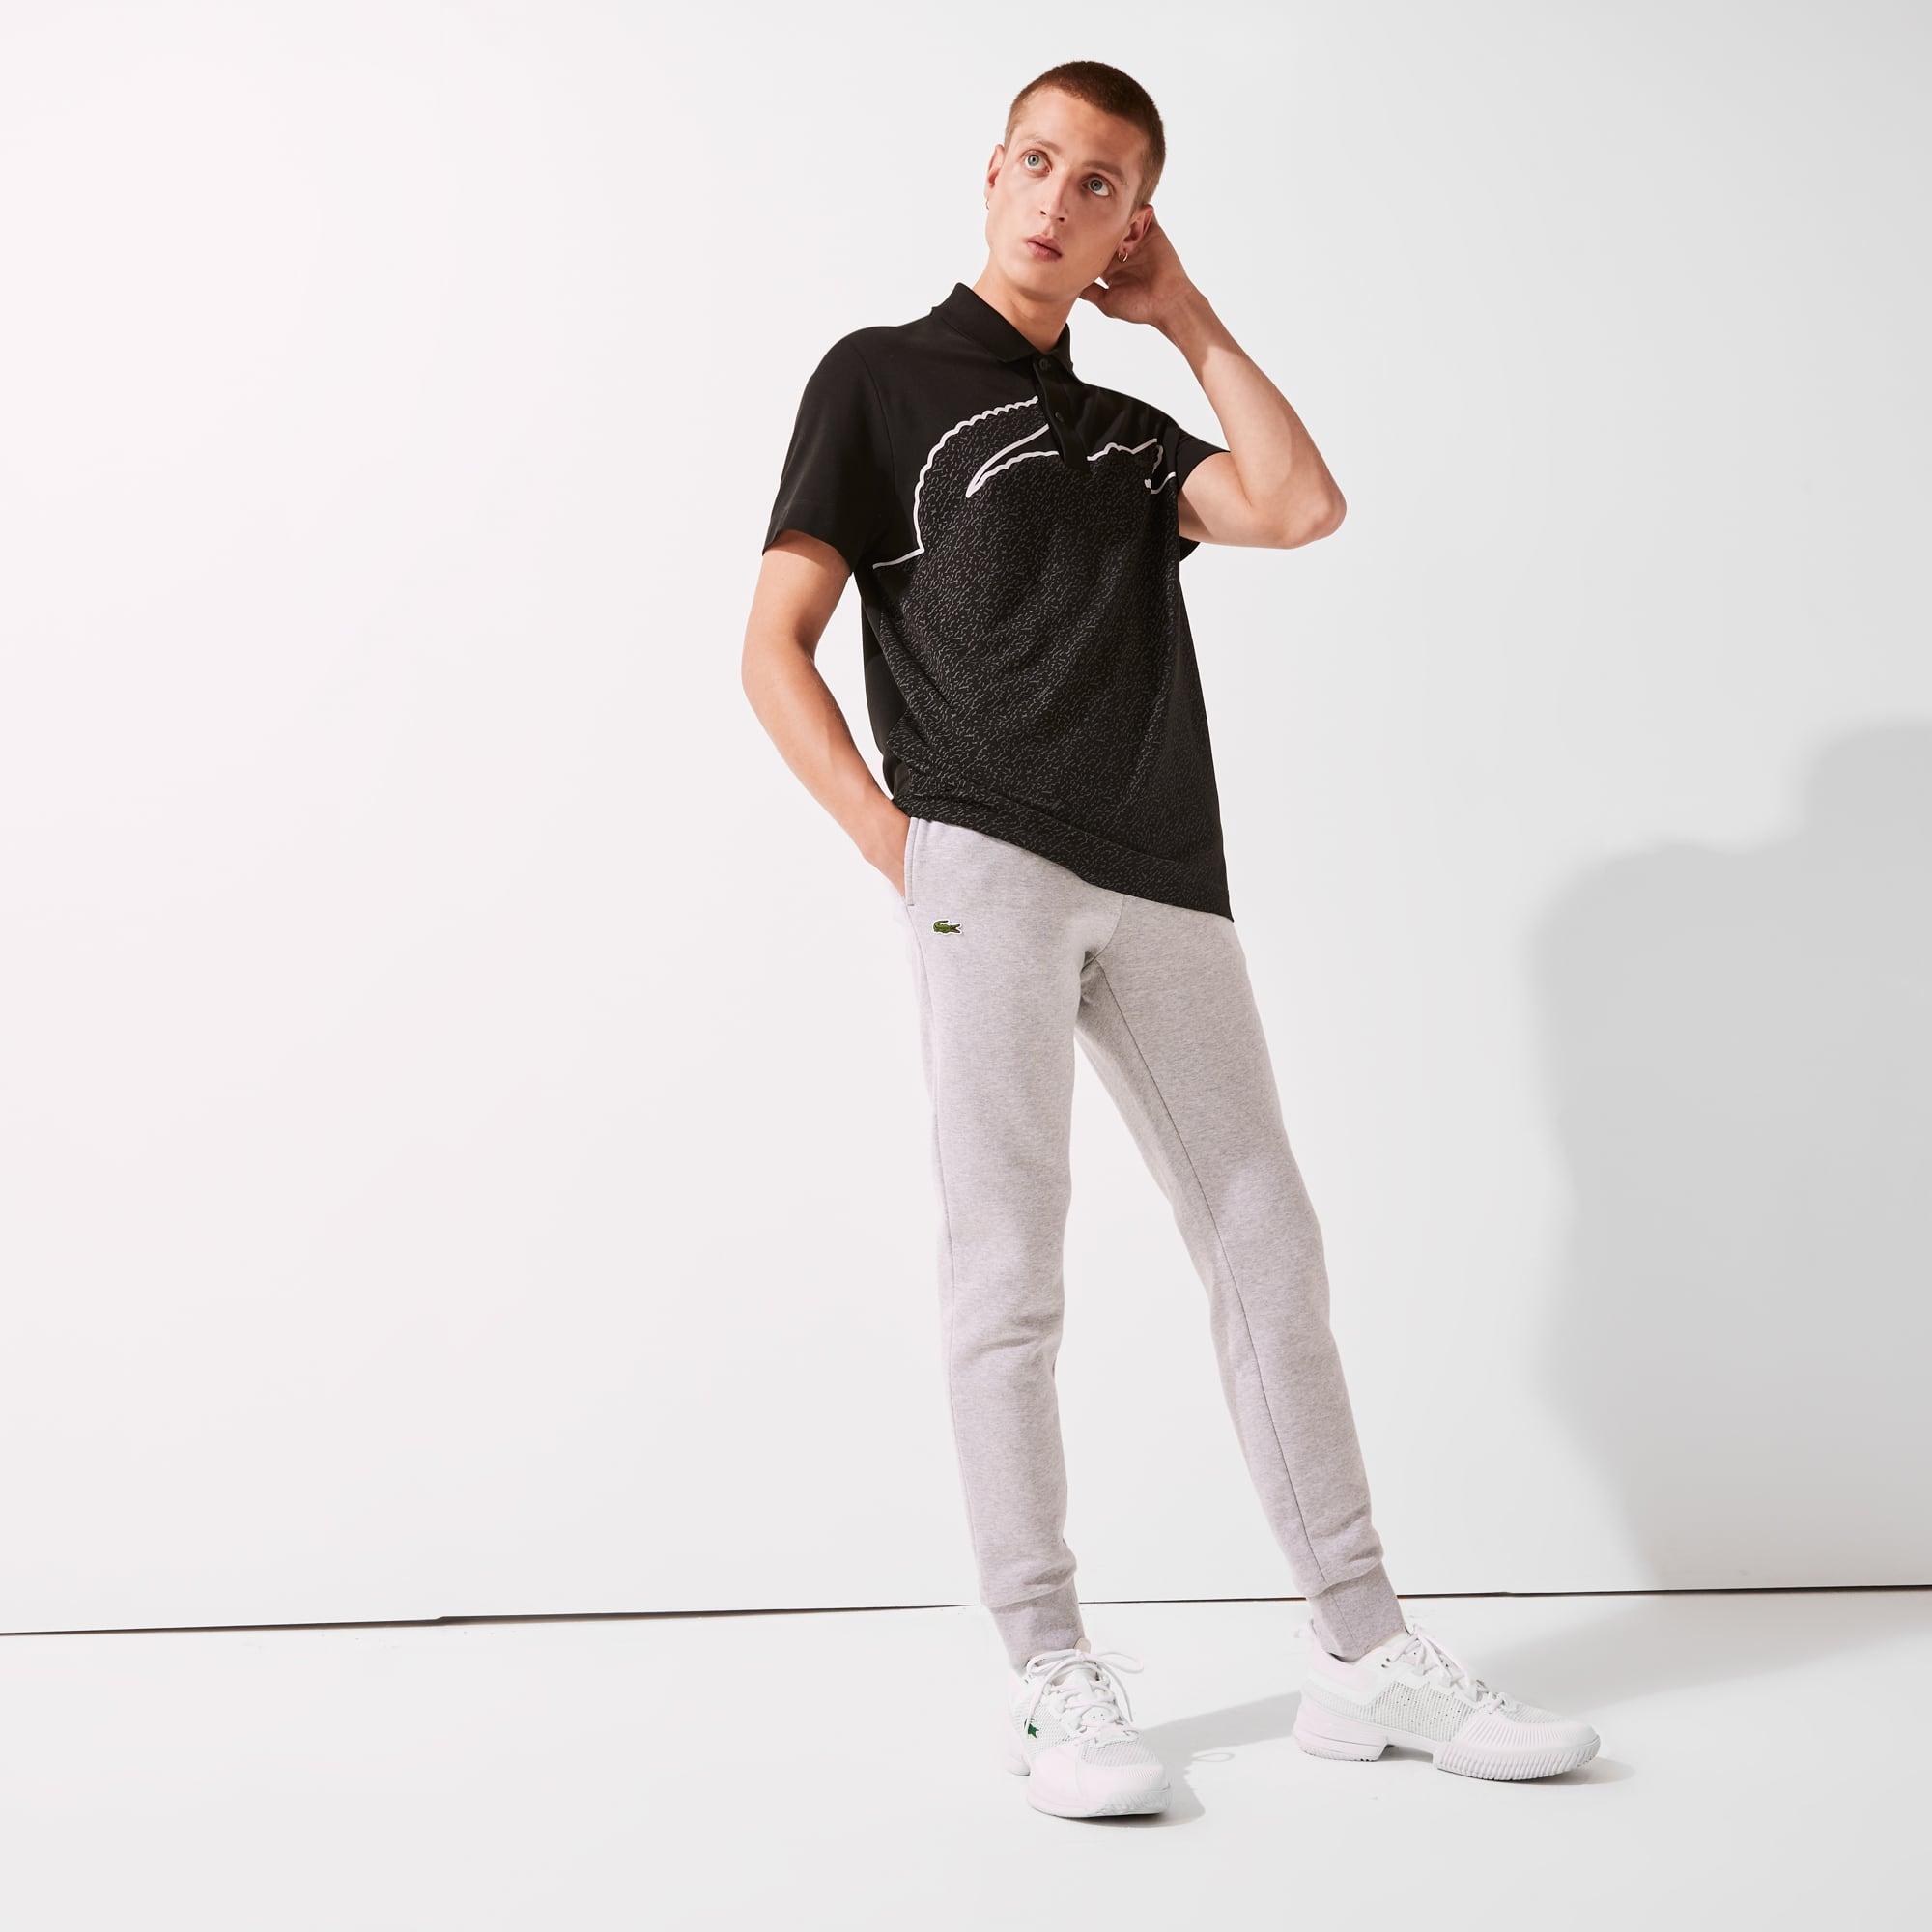 Herren LACOSTE SPORT Tennis Jogginghose aus Baumwoll-Fleece